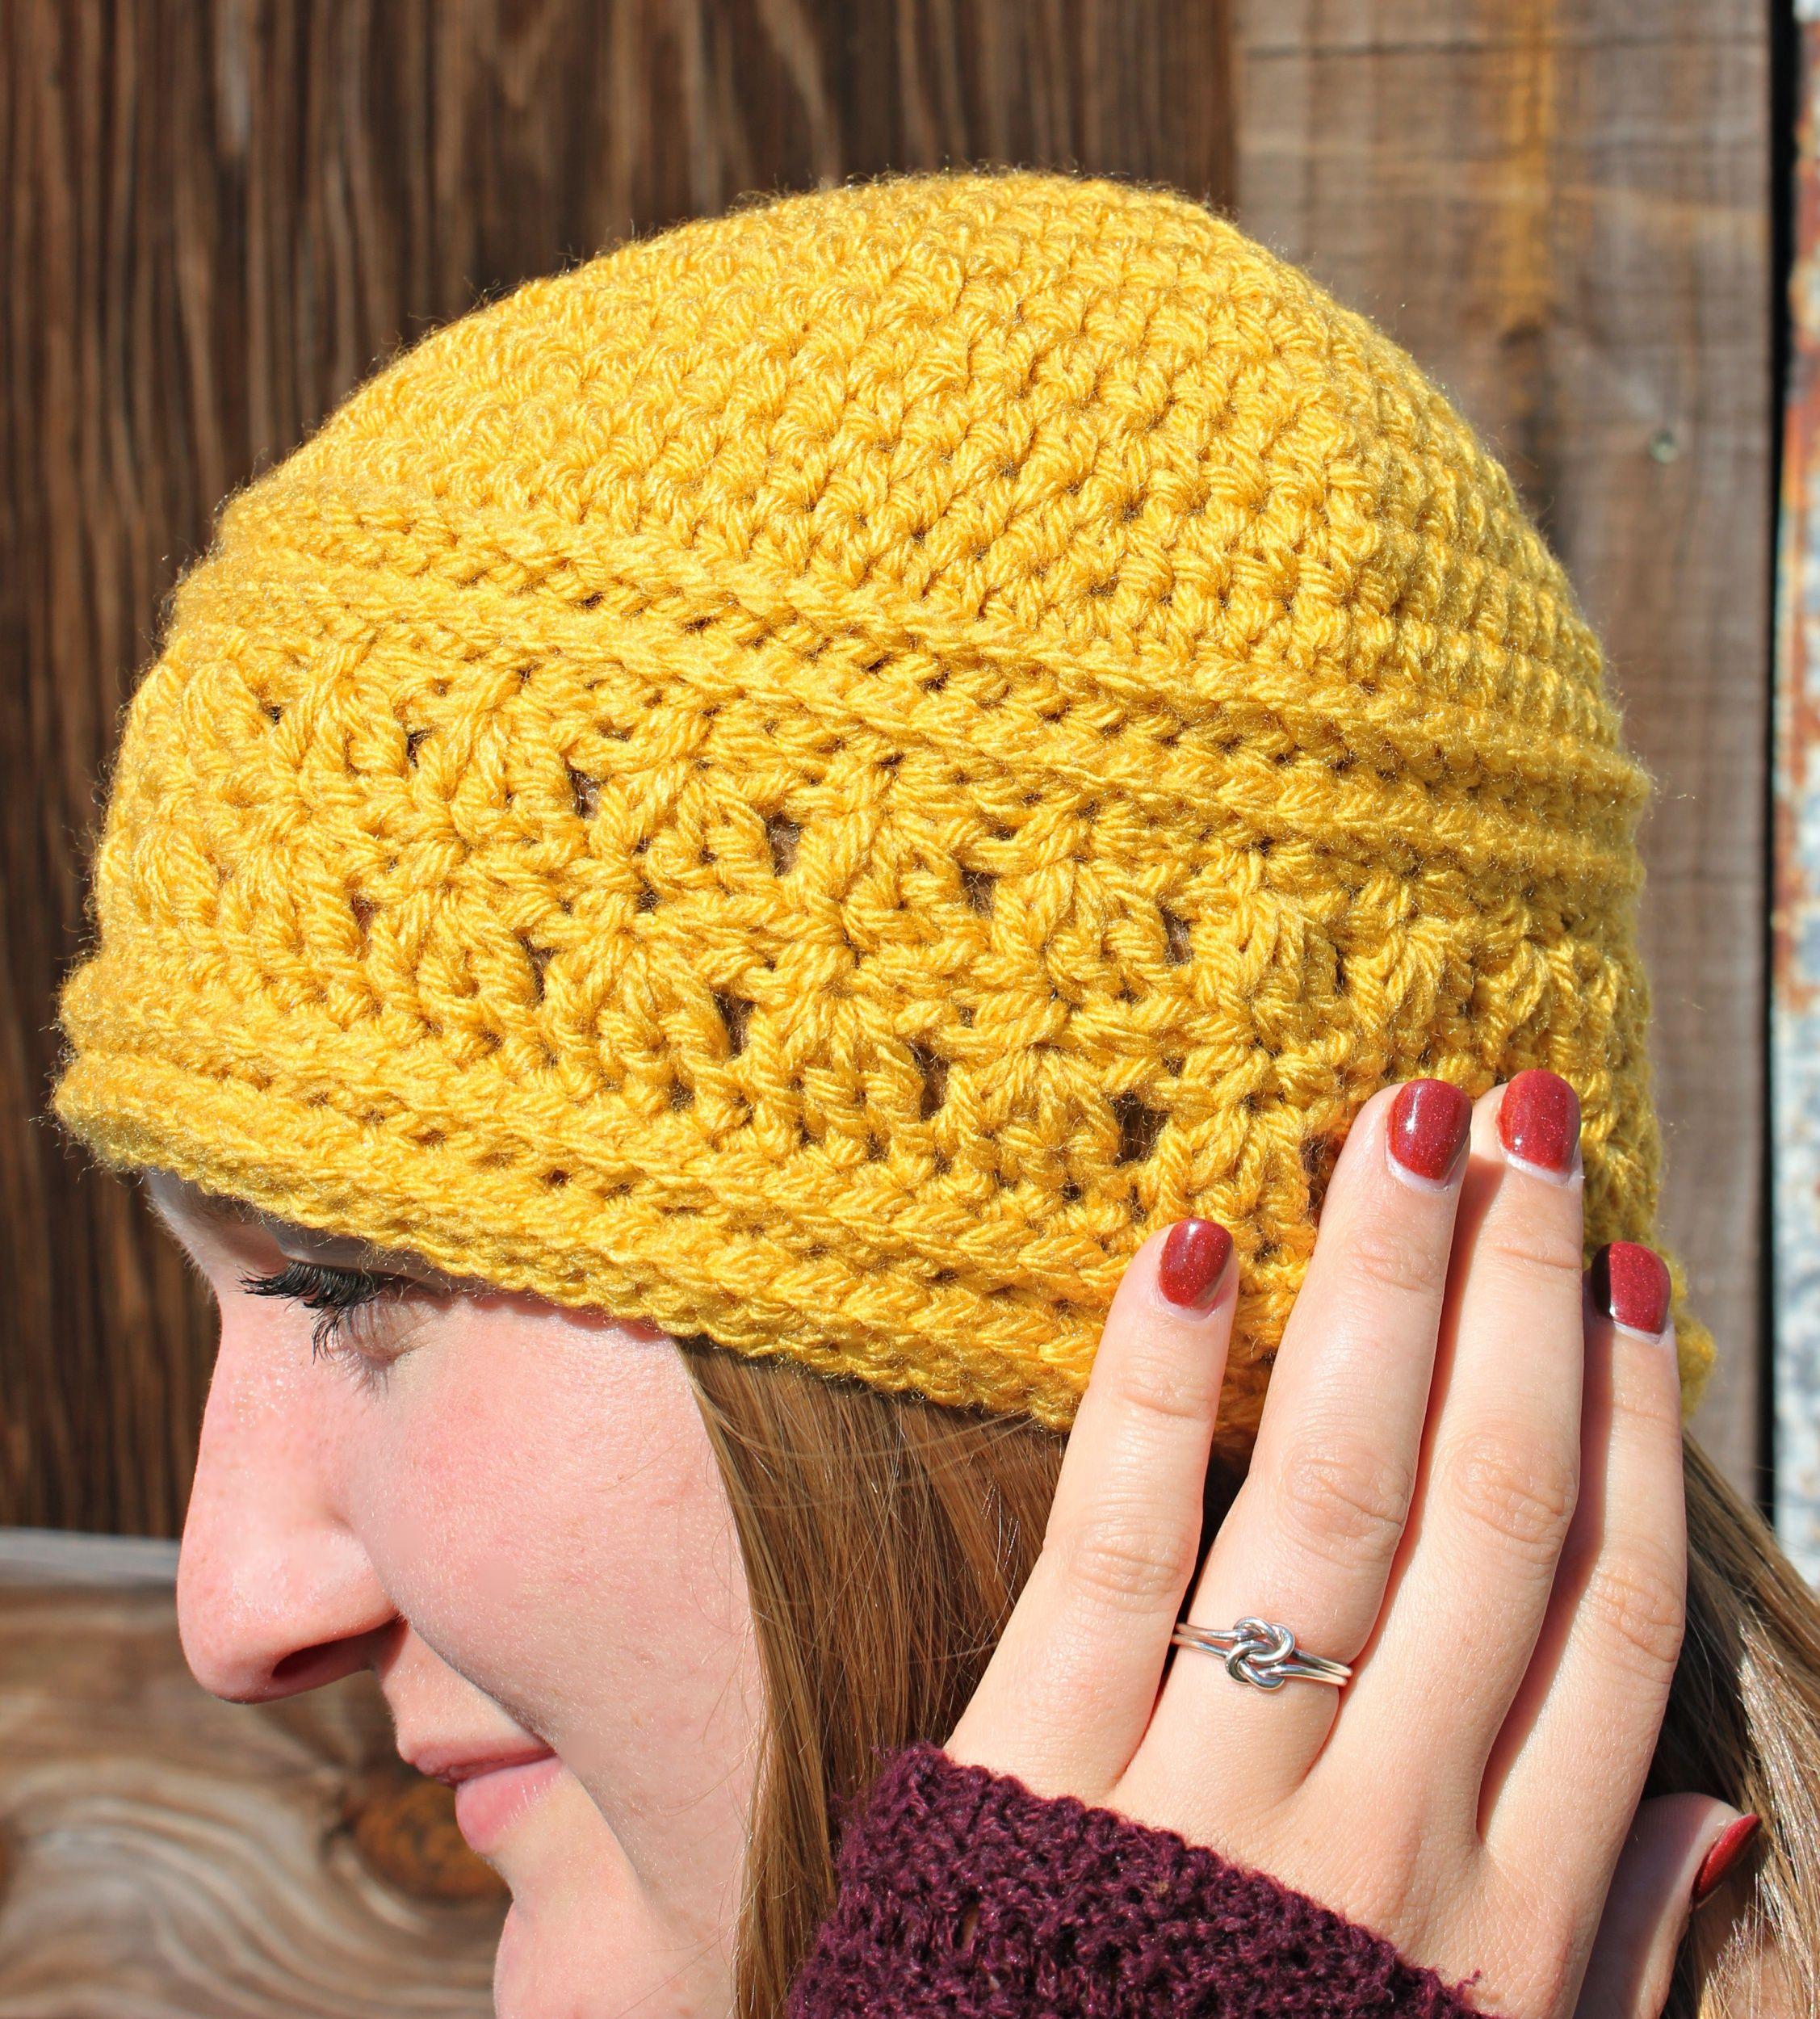 Crochet hat sister gift chemo headwear valentine gift